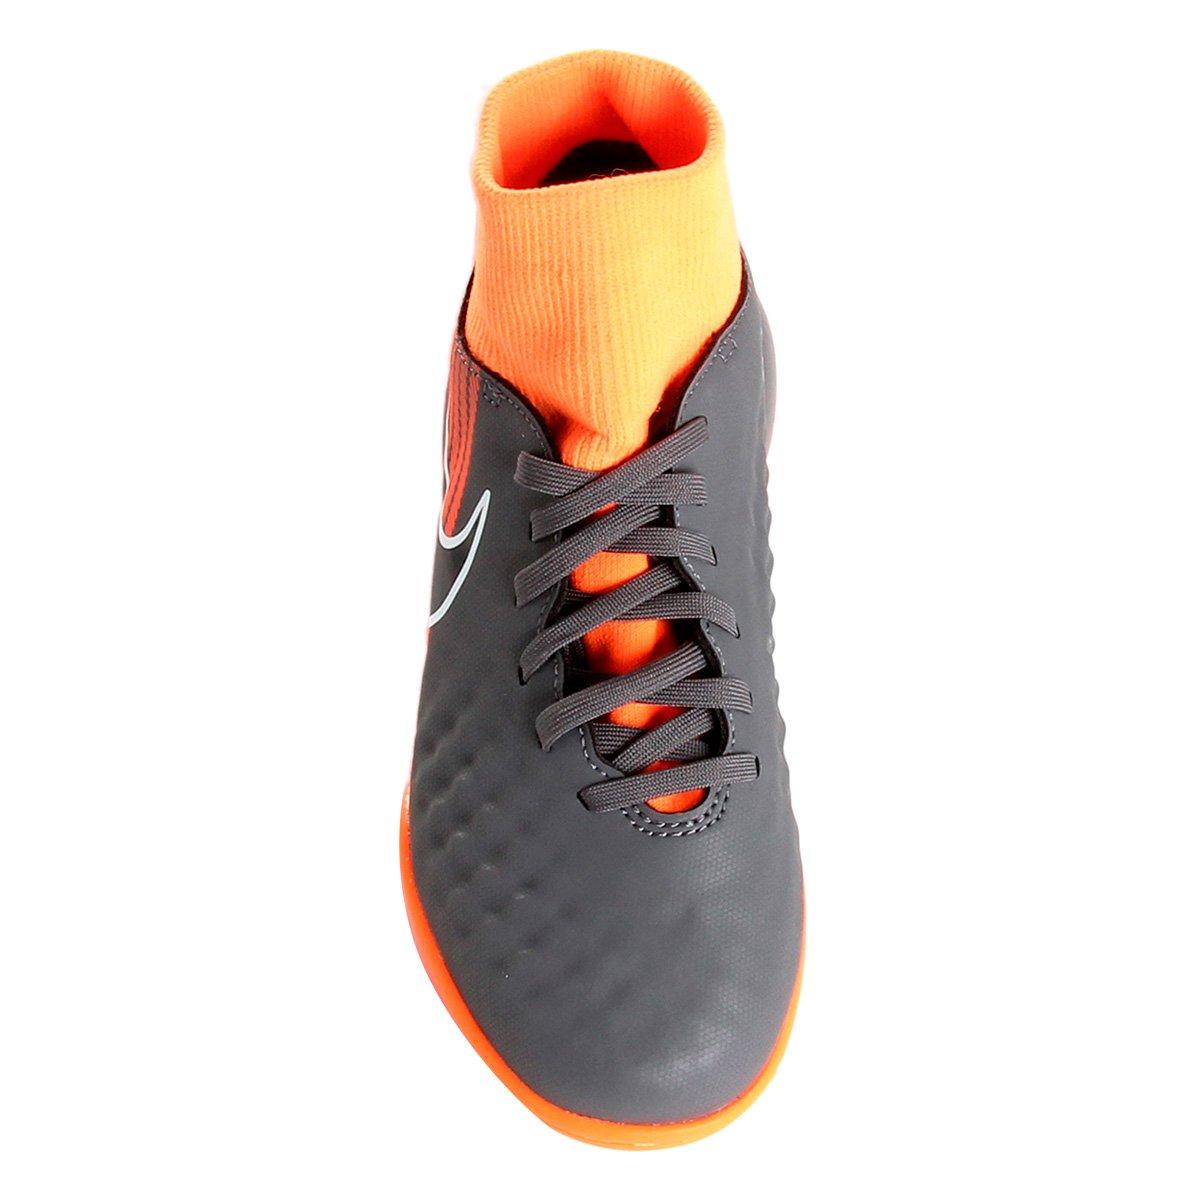 Chuteira Futsal Nike Magista Obra 2 Academy Dinamic Fit Infantil ... 6e0bf441567f0